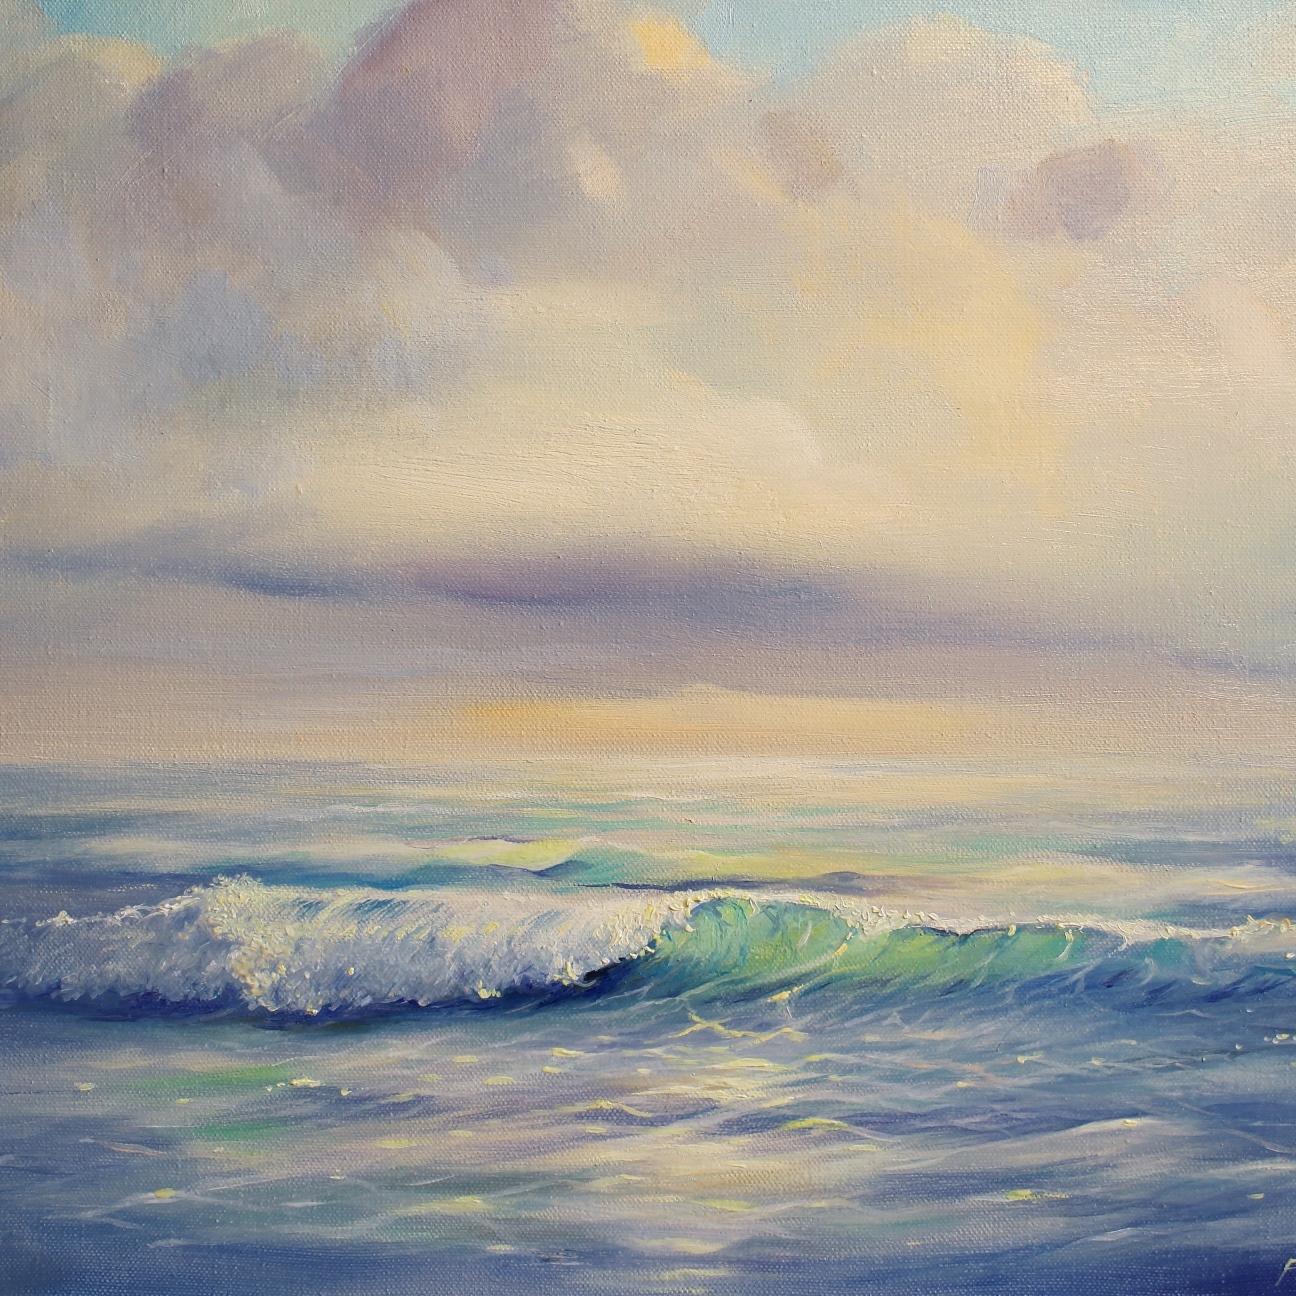 Breath of the Ocean